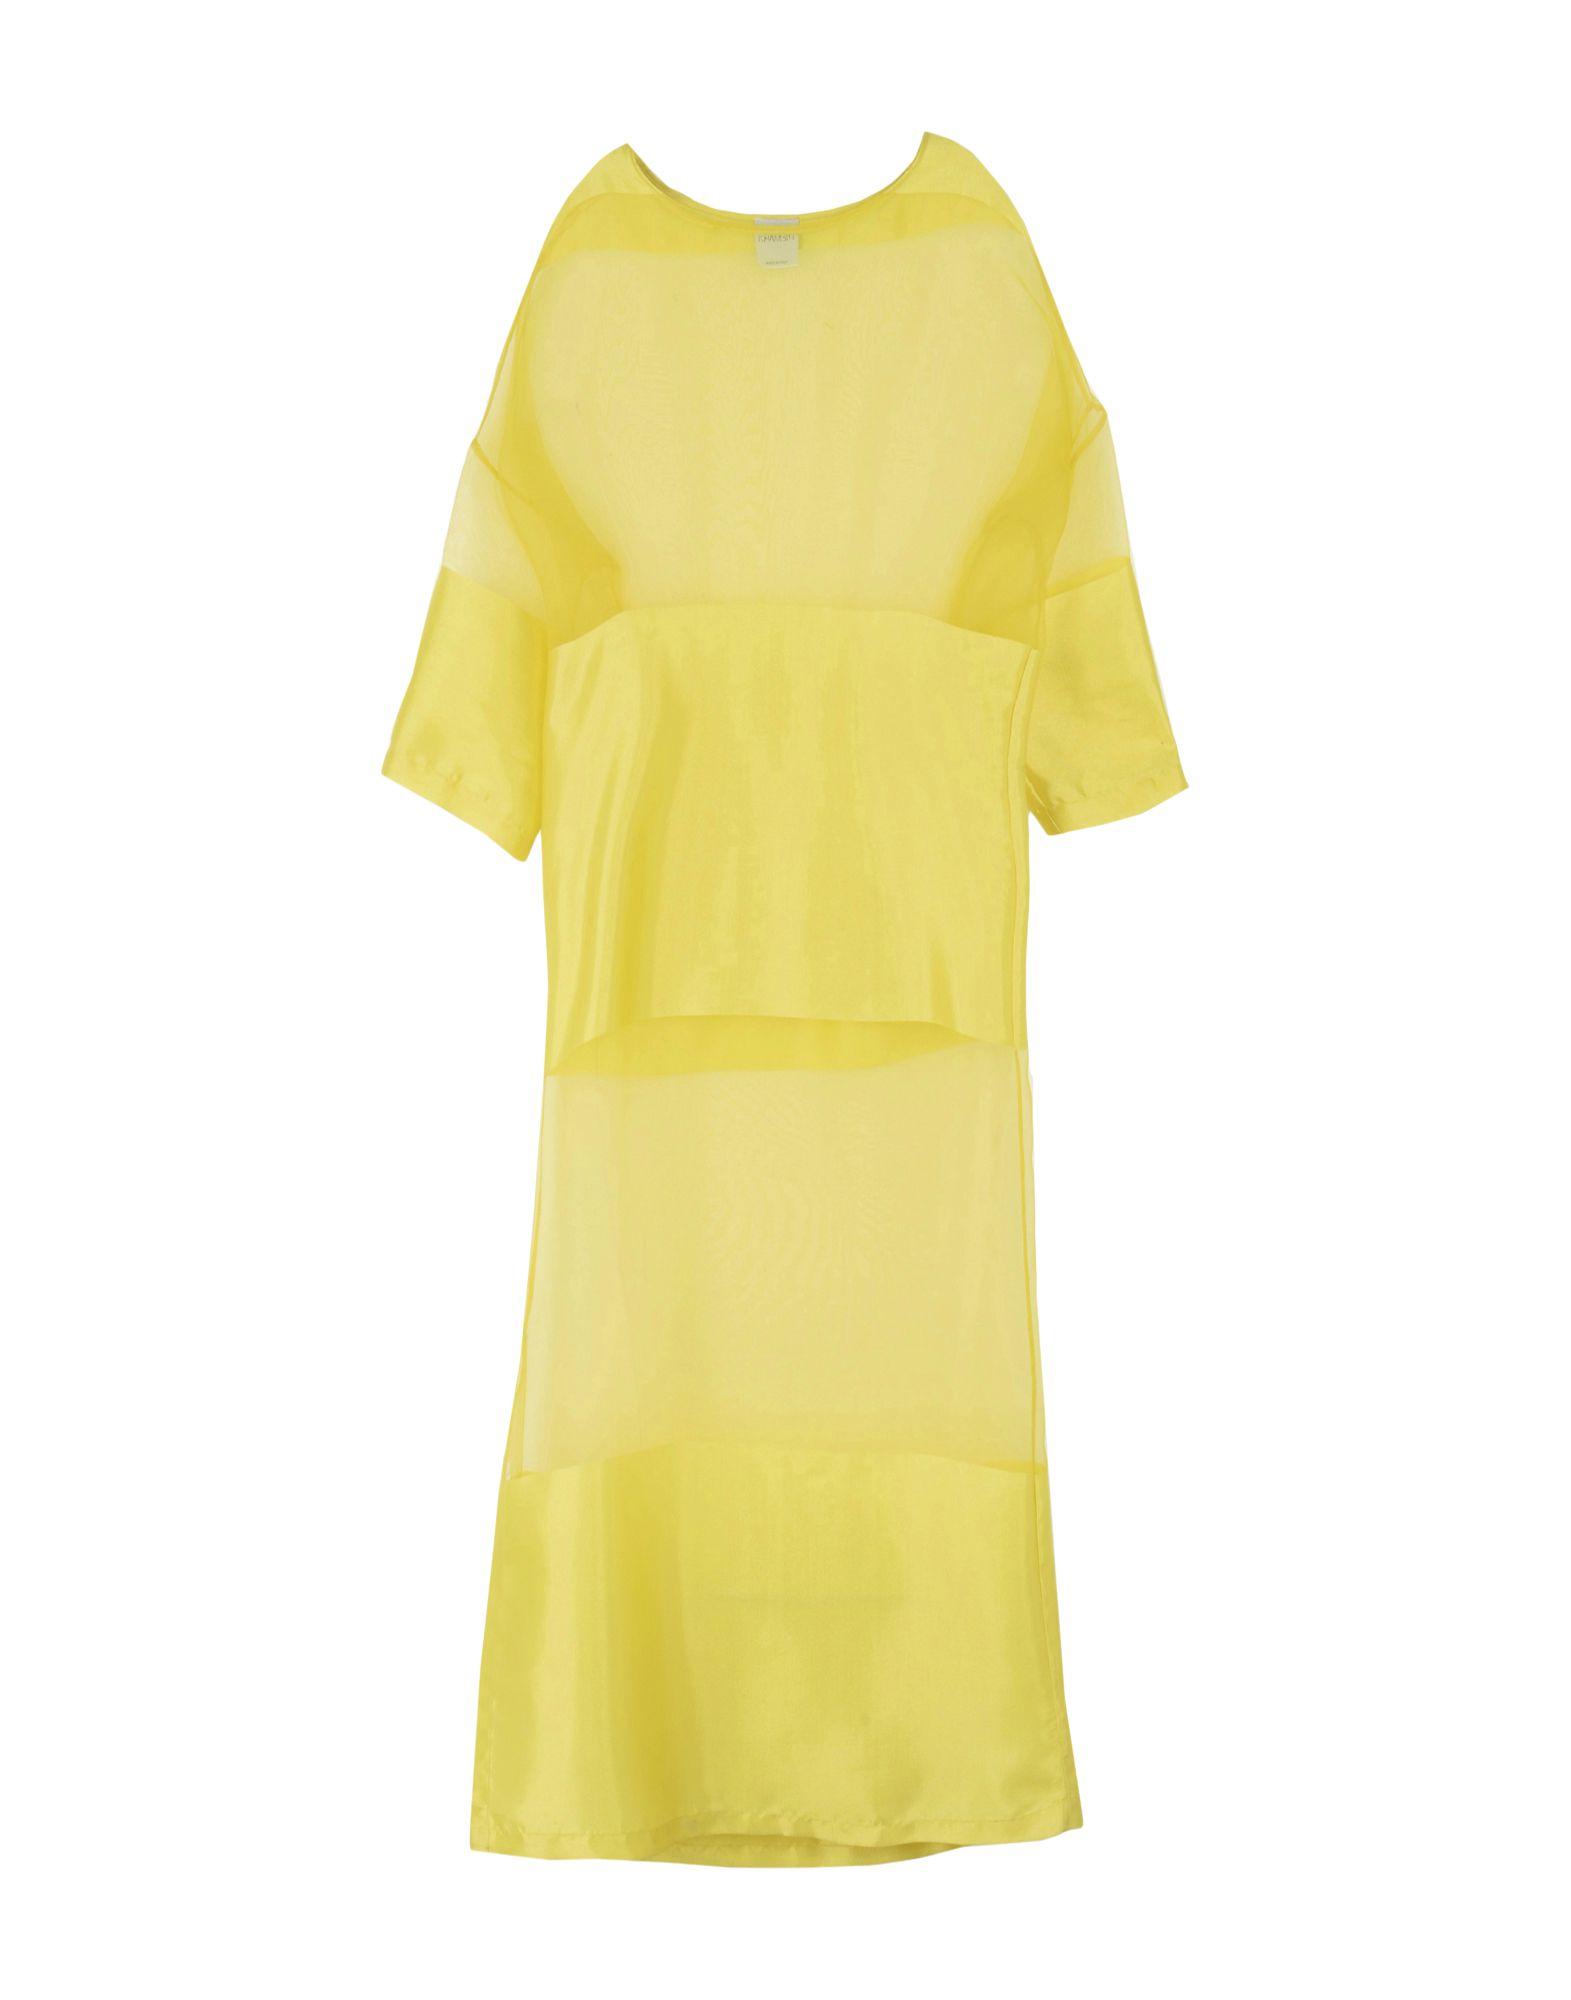 KHAMSIN Платье длиной 3/4 lisa corti платье длиной 3 4